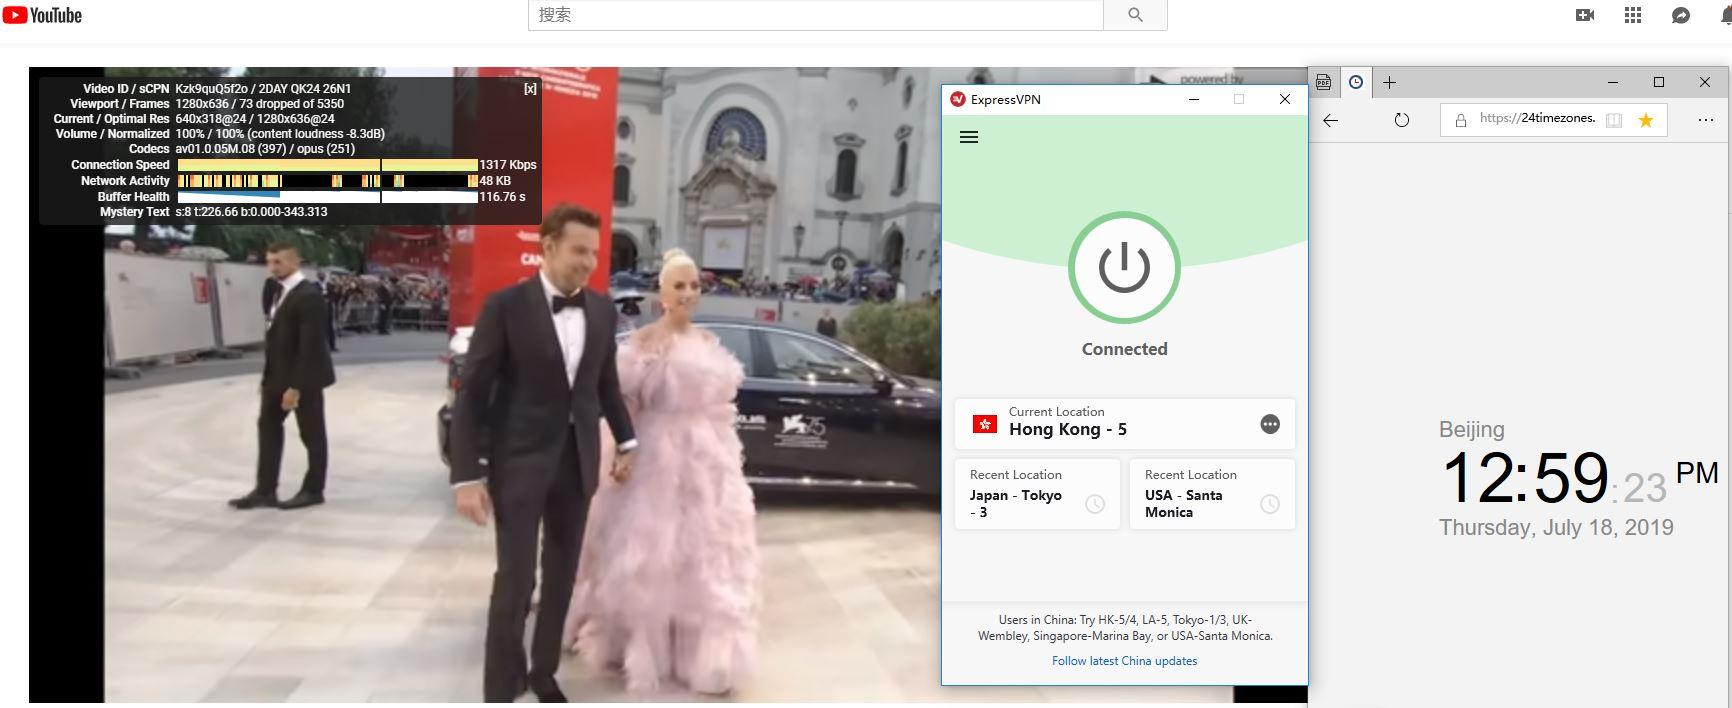 expressvpn Windows 翻墙 科学上午香港-5服务器 YouTube速度测试-20190718